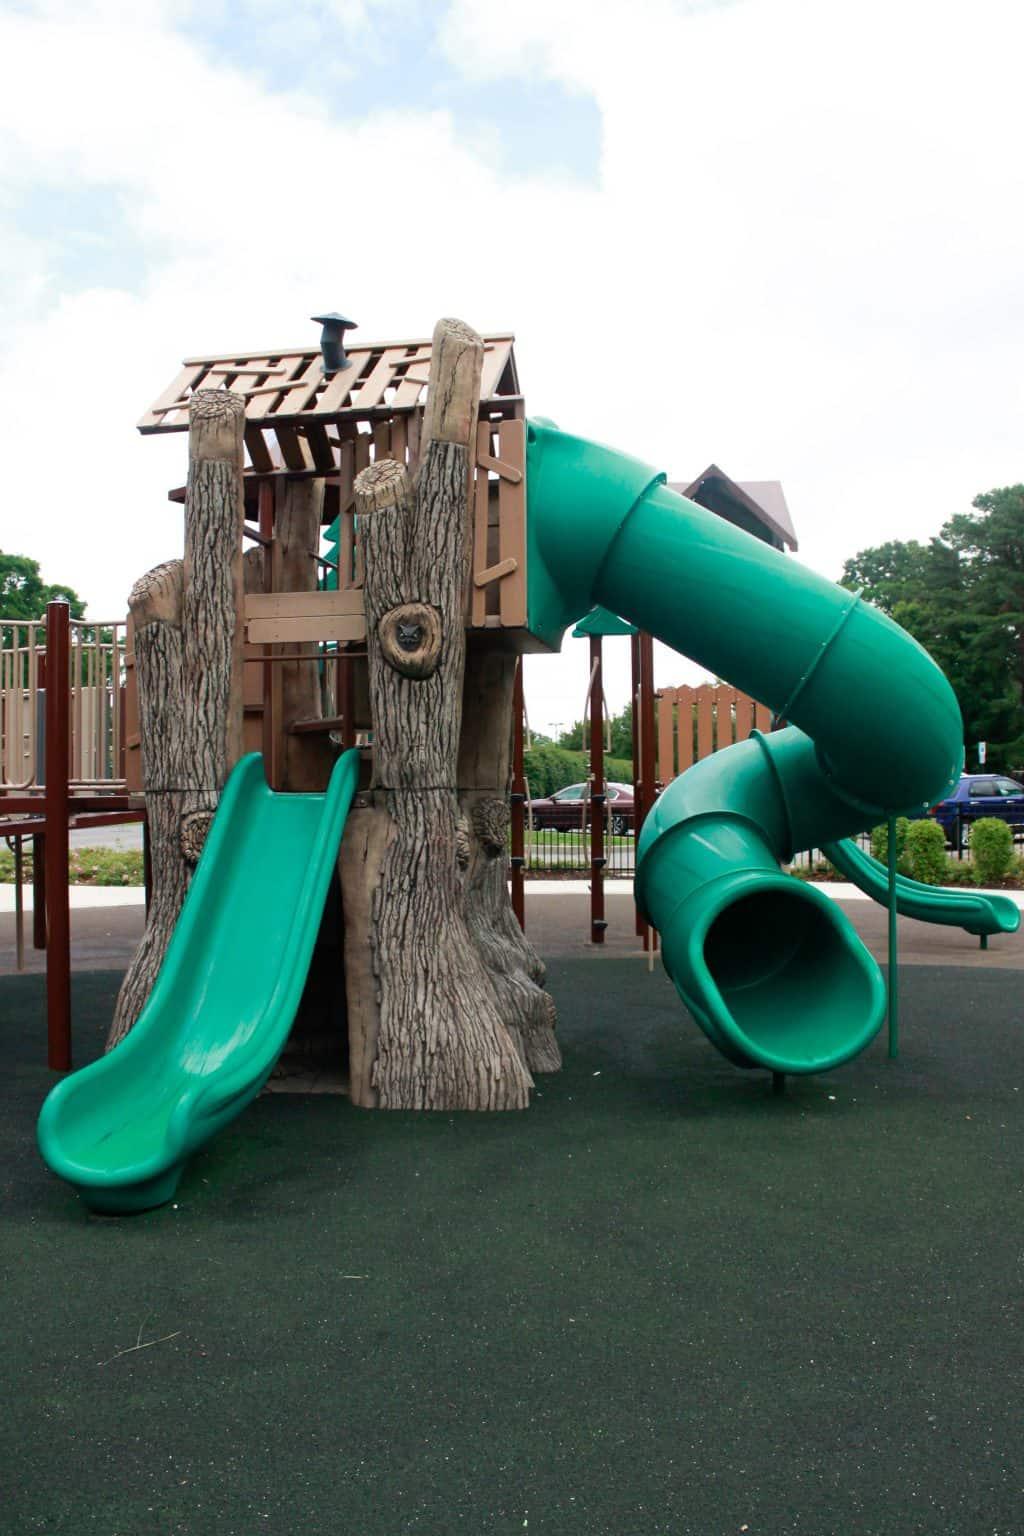 windward-beach-park-playground-brick-nj_28266703515_o-1024x1536